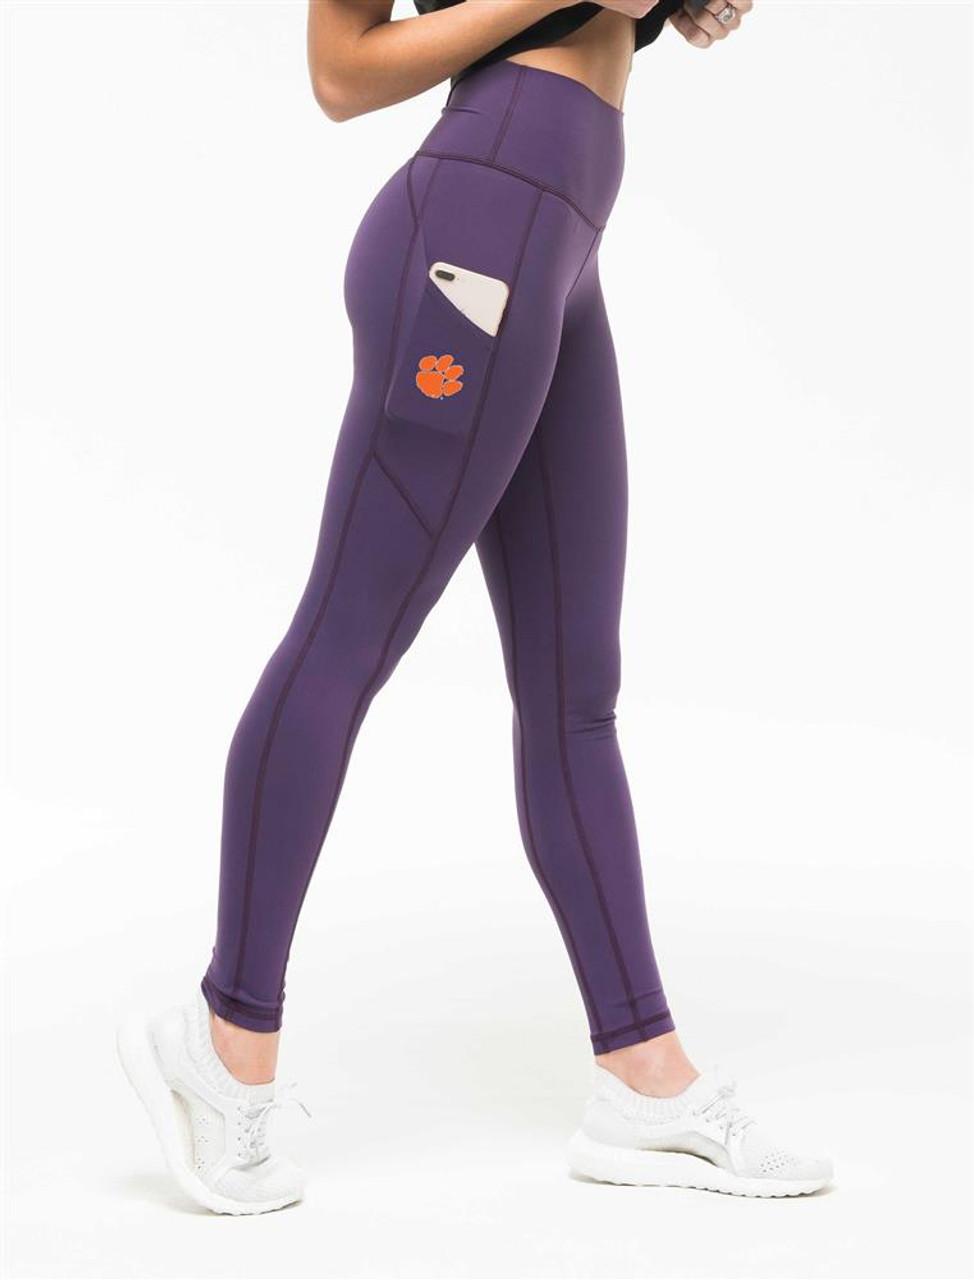 Ladies Clemson University Tigers iLeggings Yoga Pants by Kadyluxe